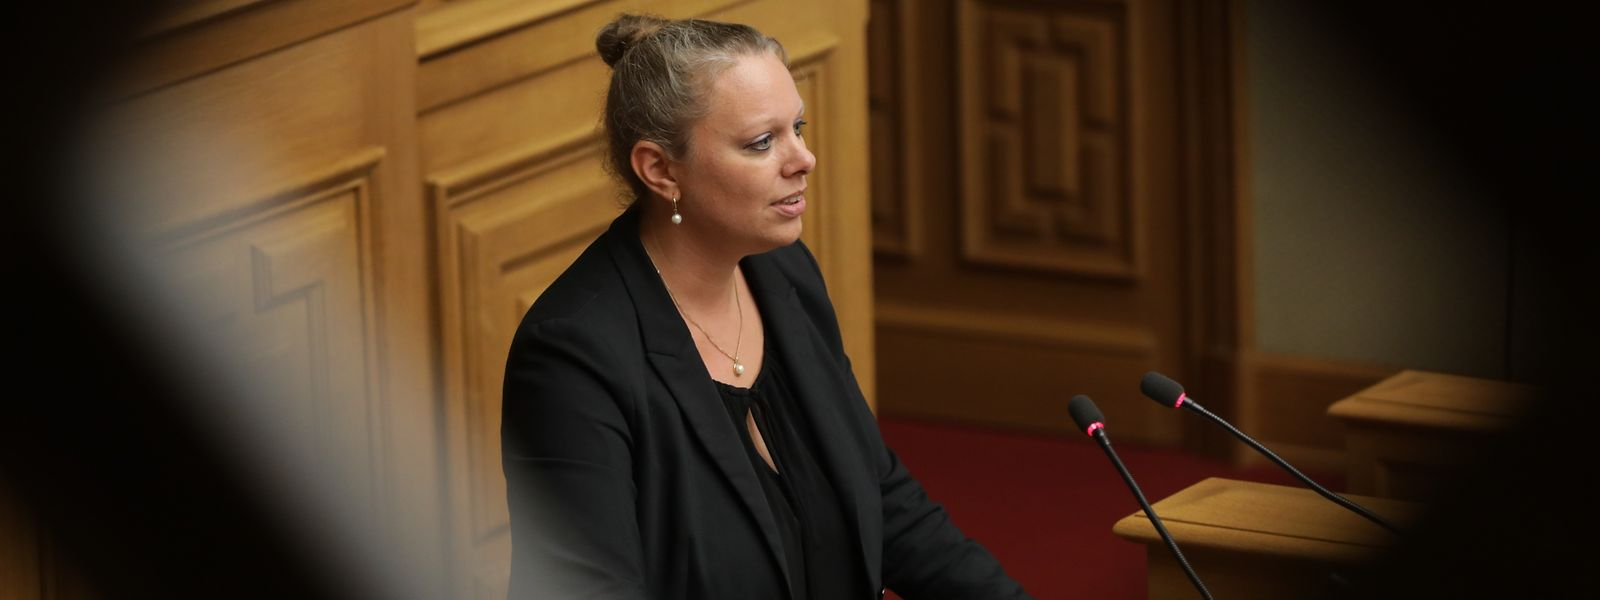 Umweltministerin Carole Dieschbourg spricht am Donnerstag in der Chamber.